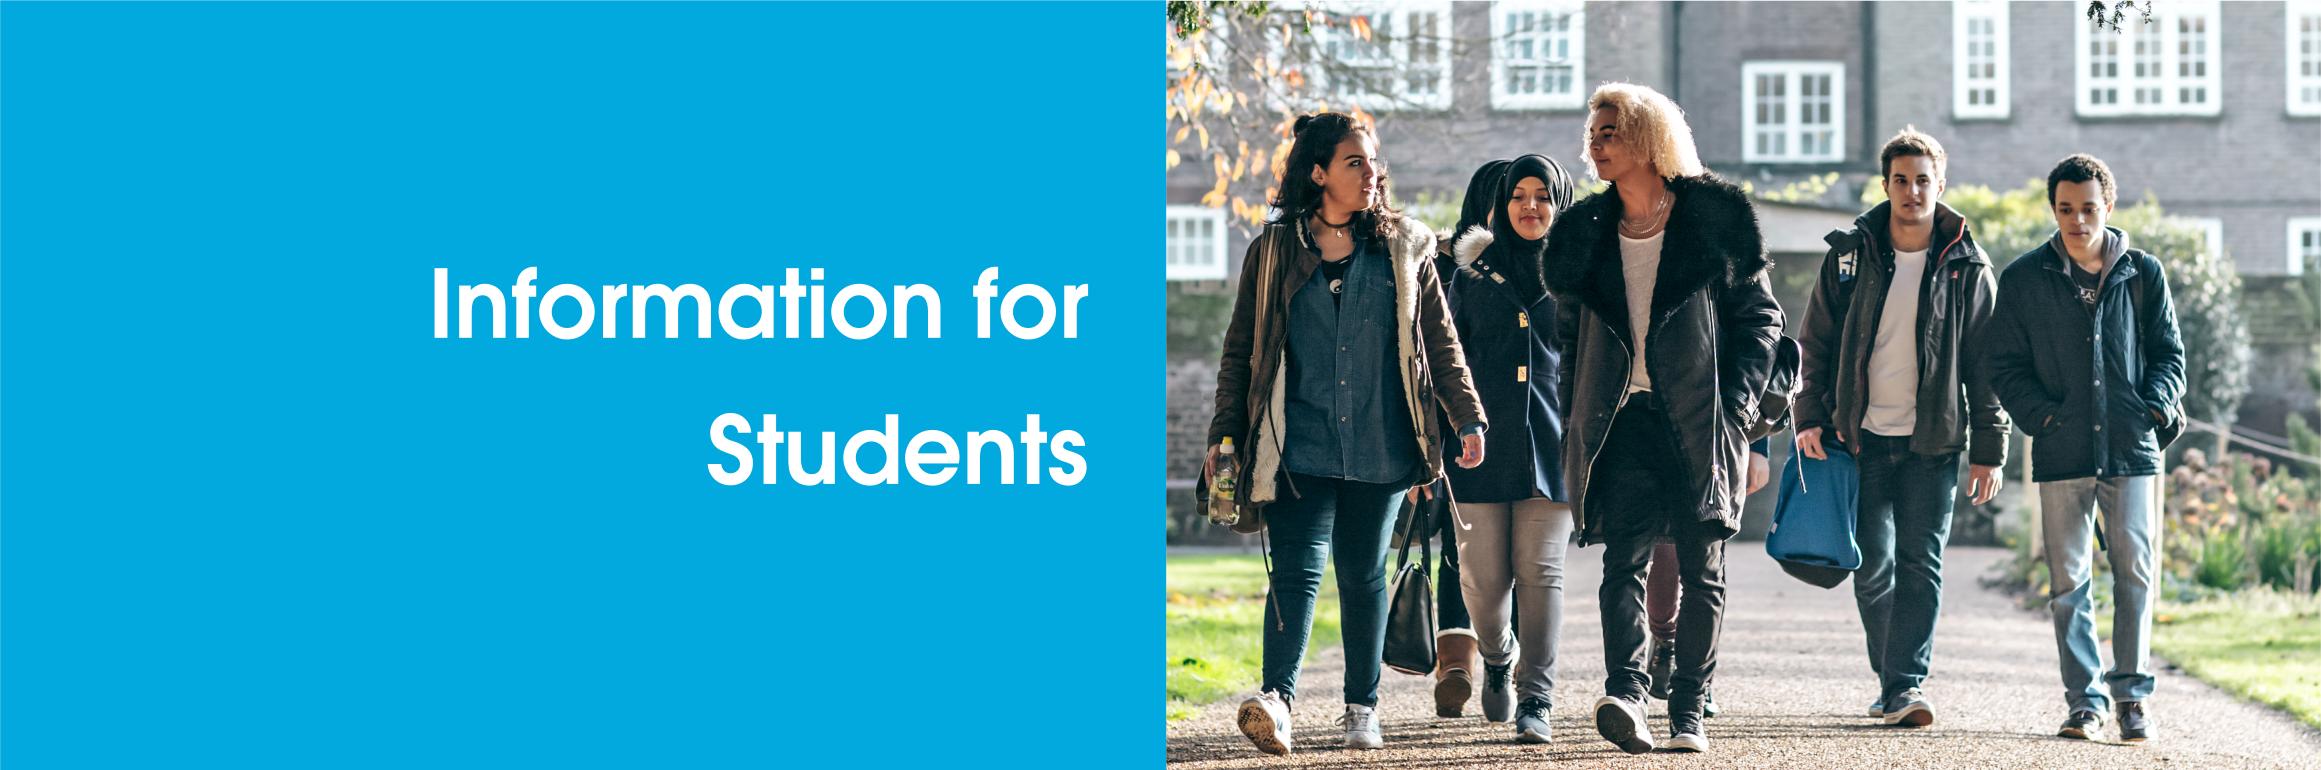 Information on Degree Apprenticeships for Arden University students